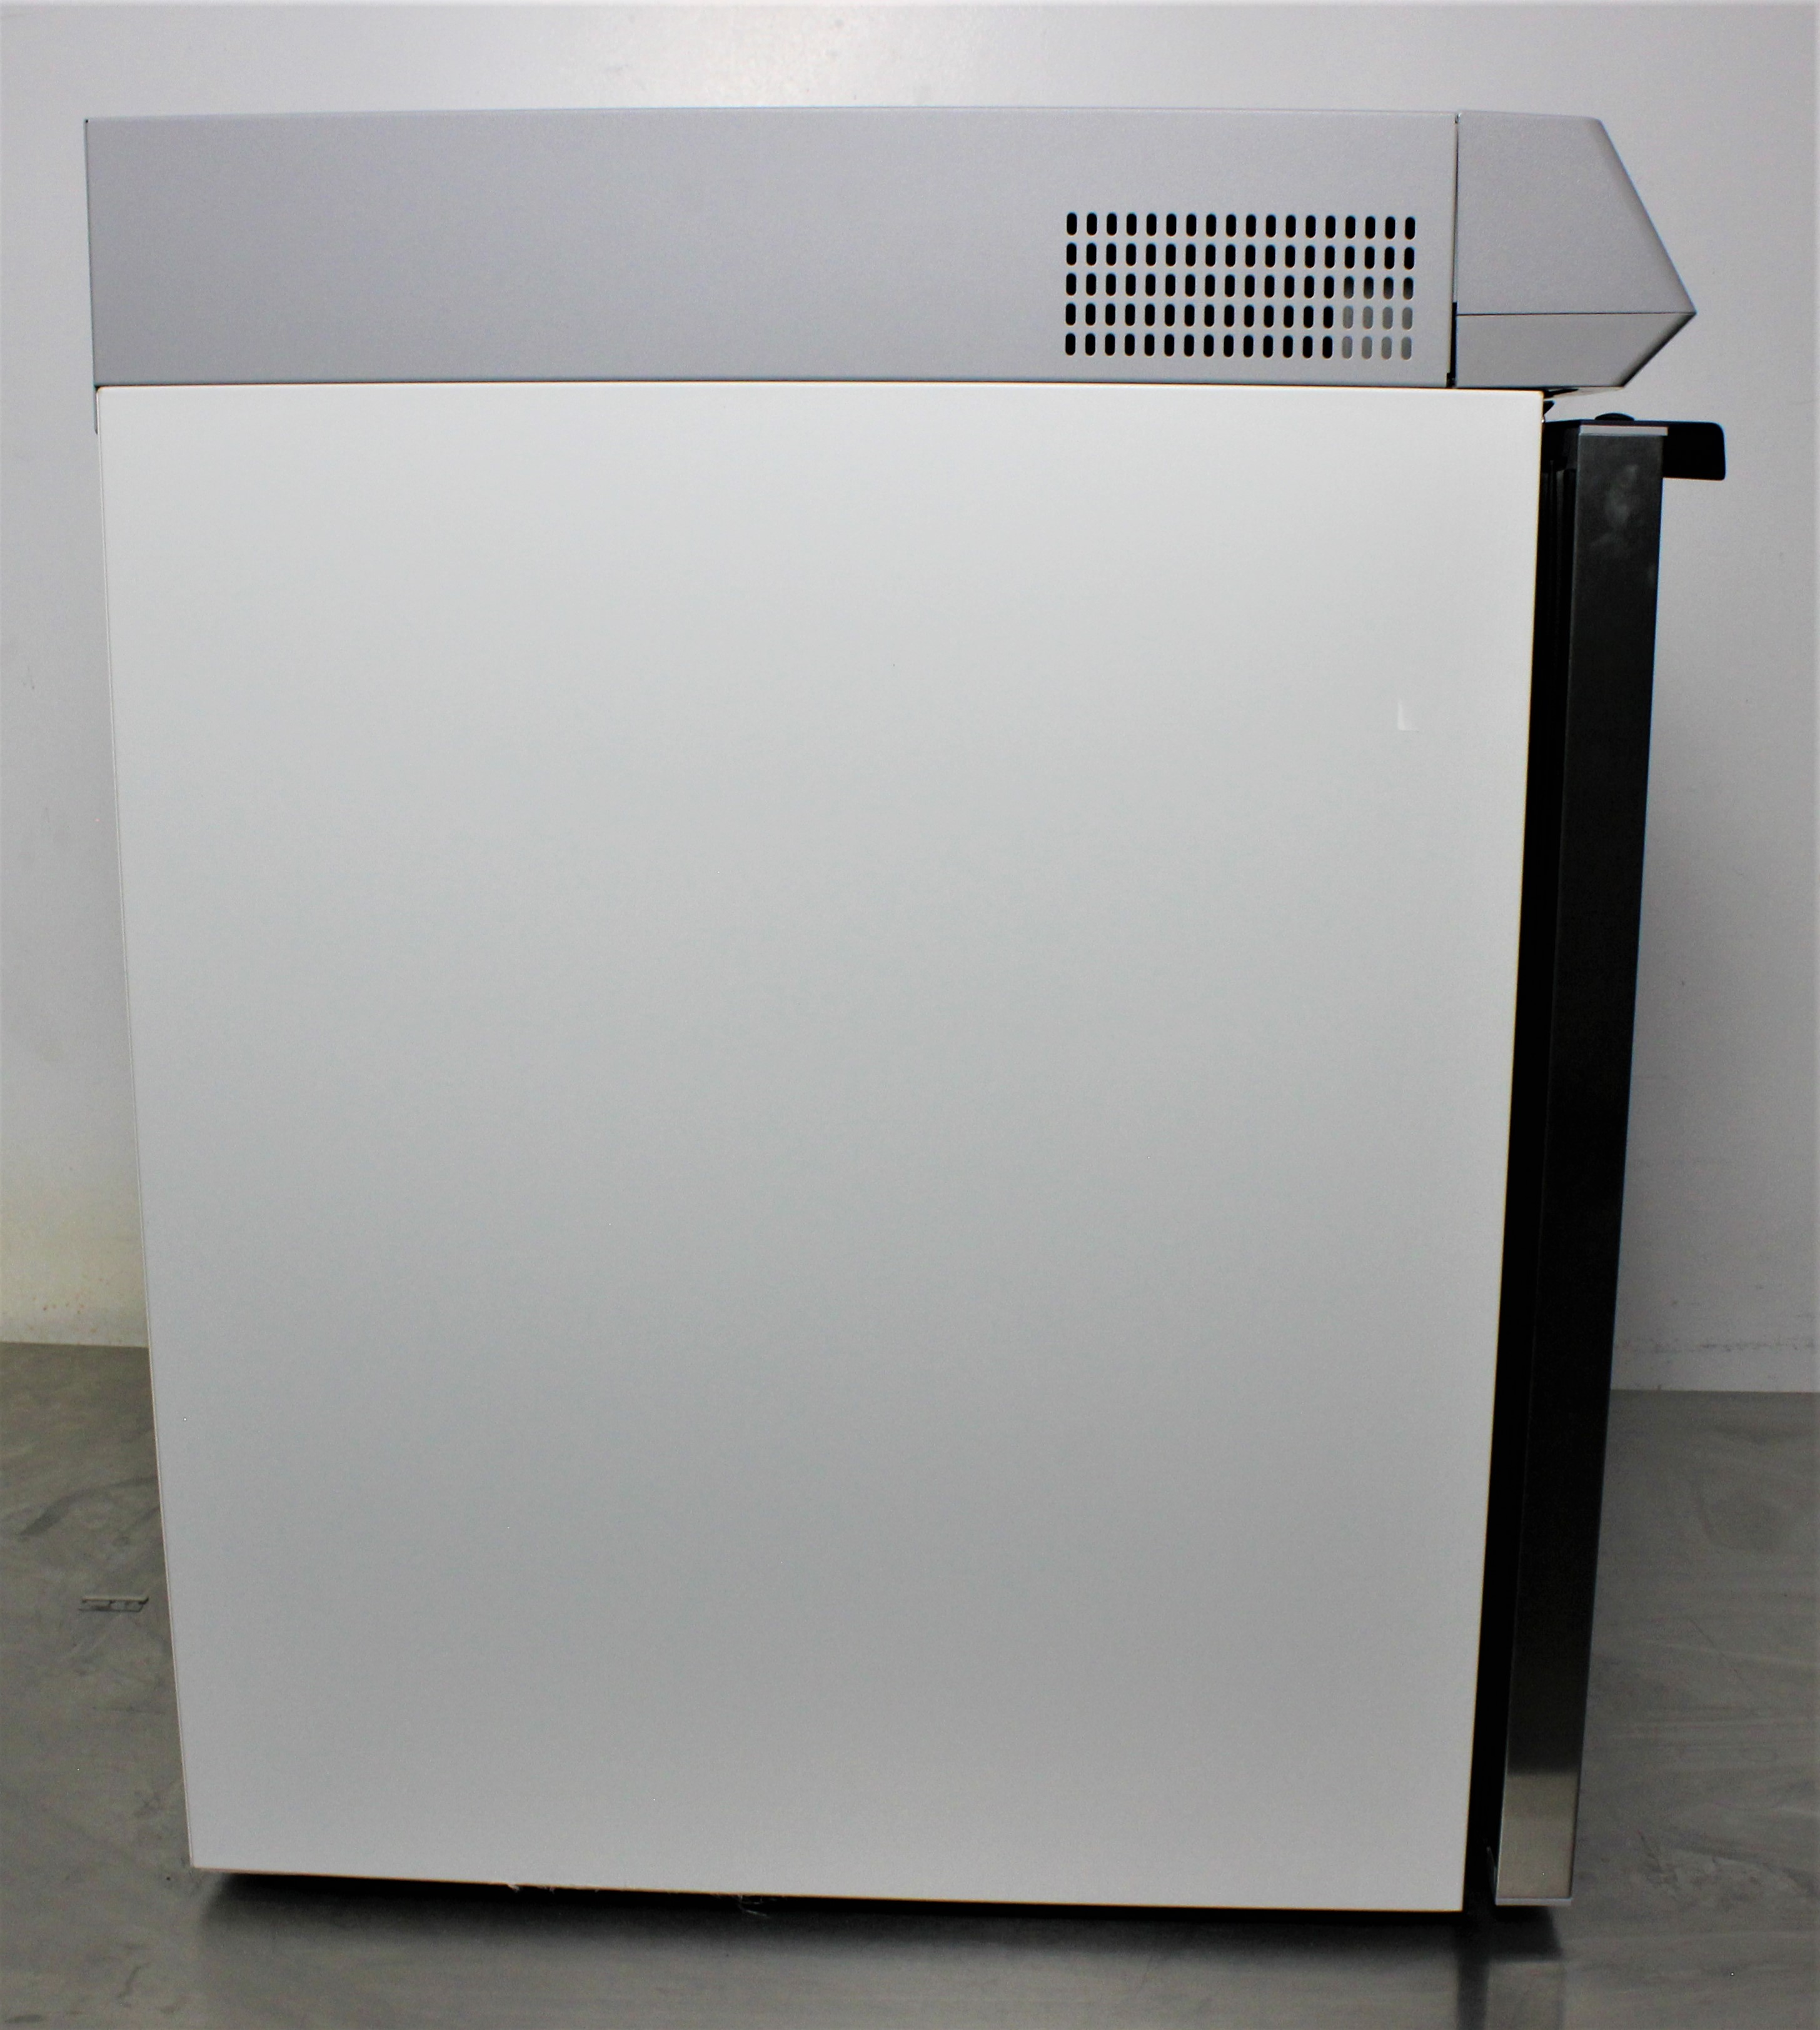 Image THERMO SCIENTIFIC TSX505GA High-Performance Refrigerator 1587102